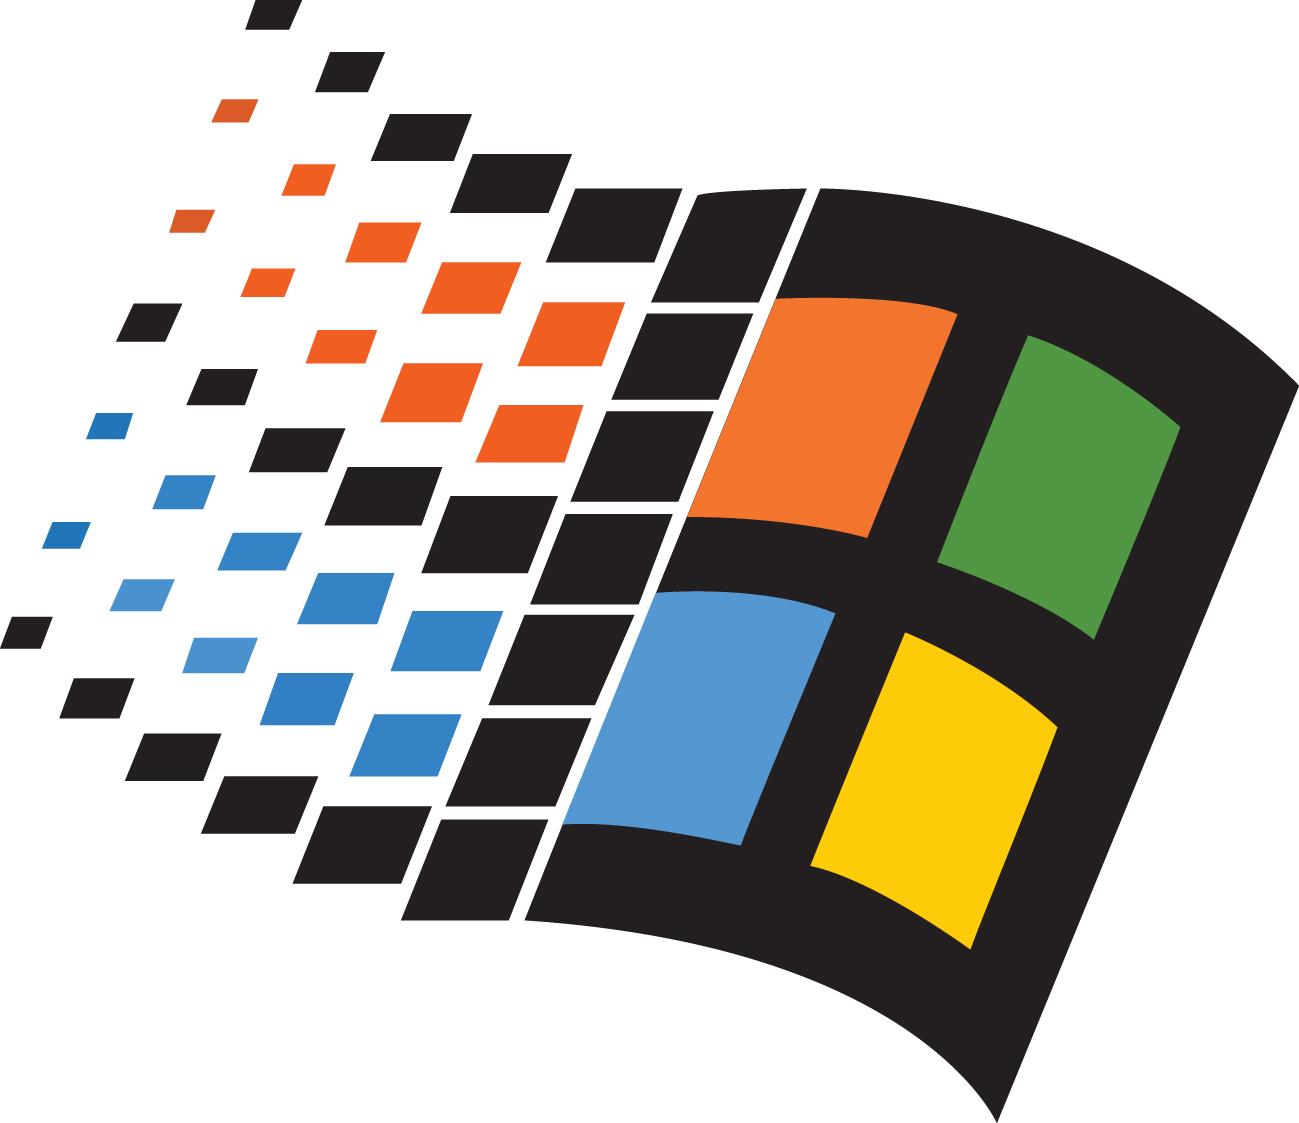 Games On Windows 311 News Prague